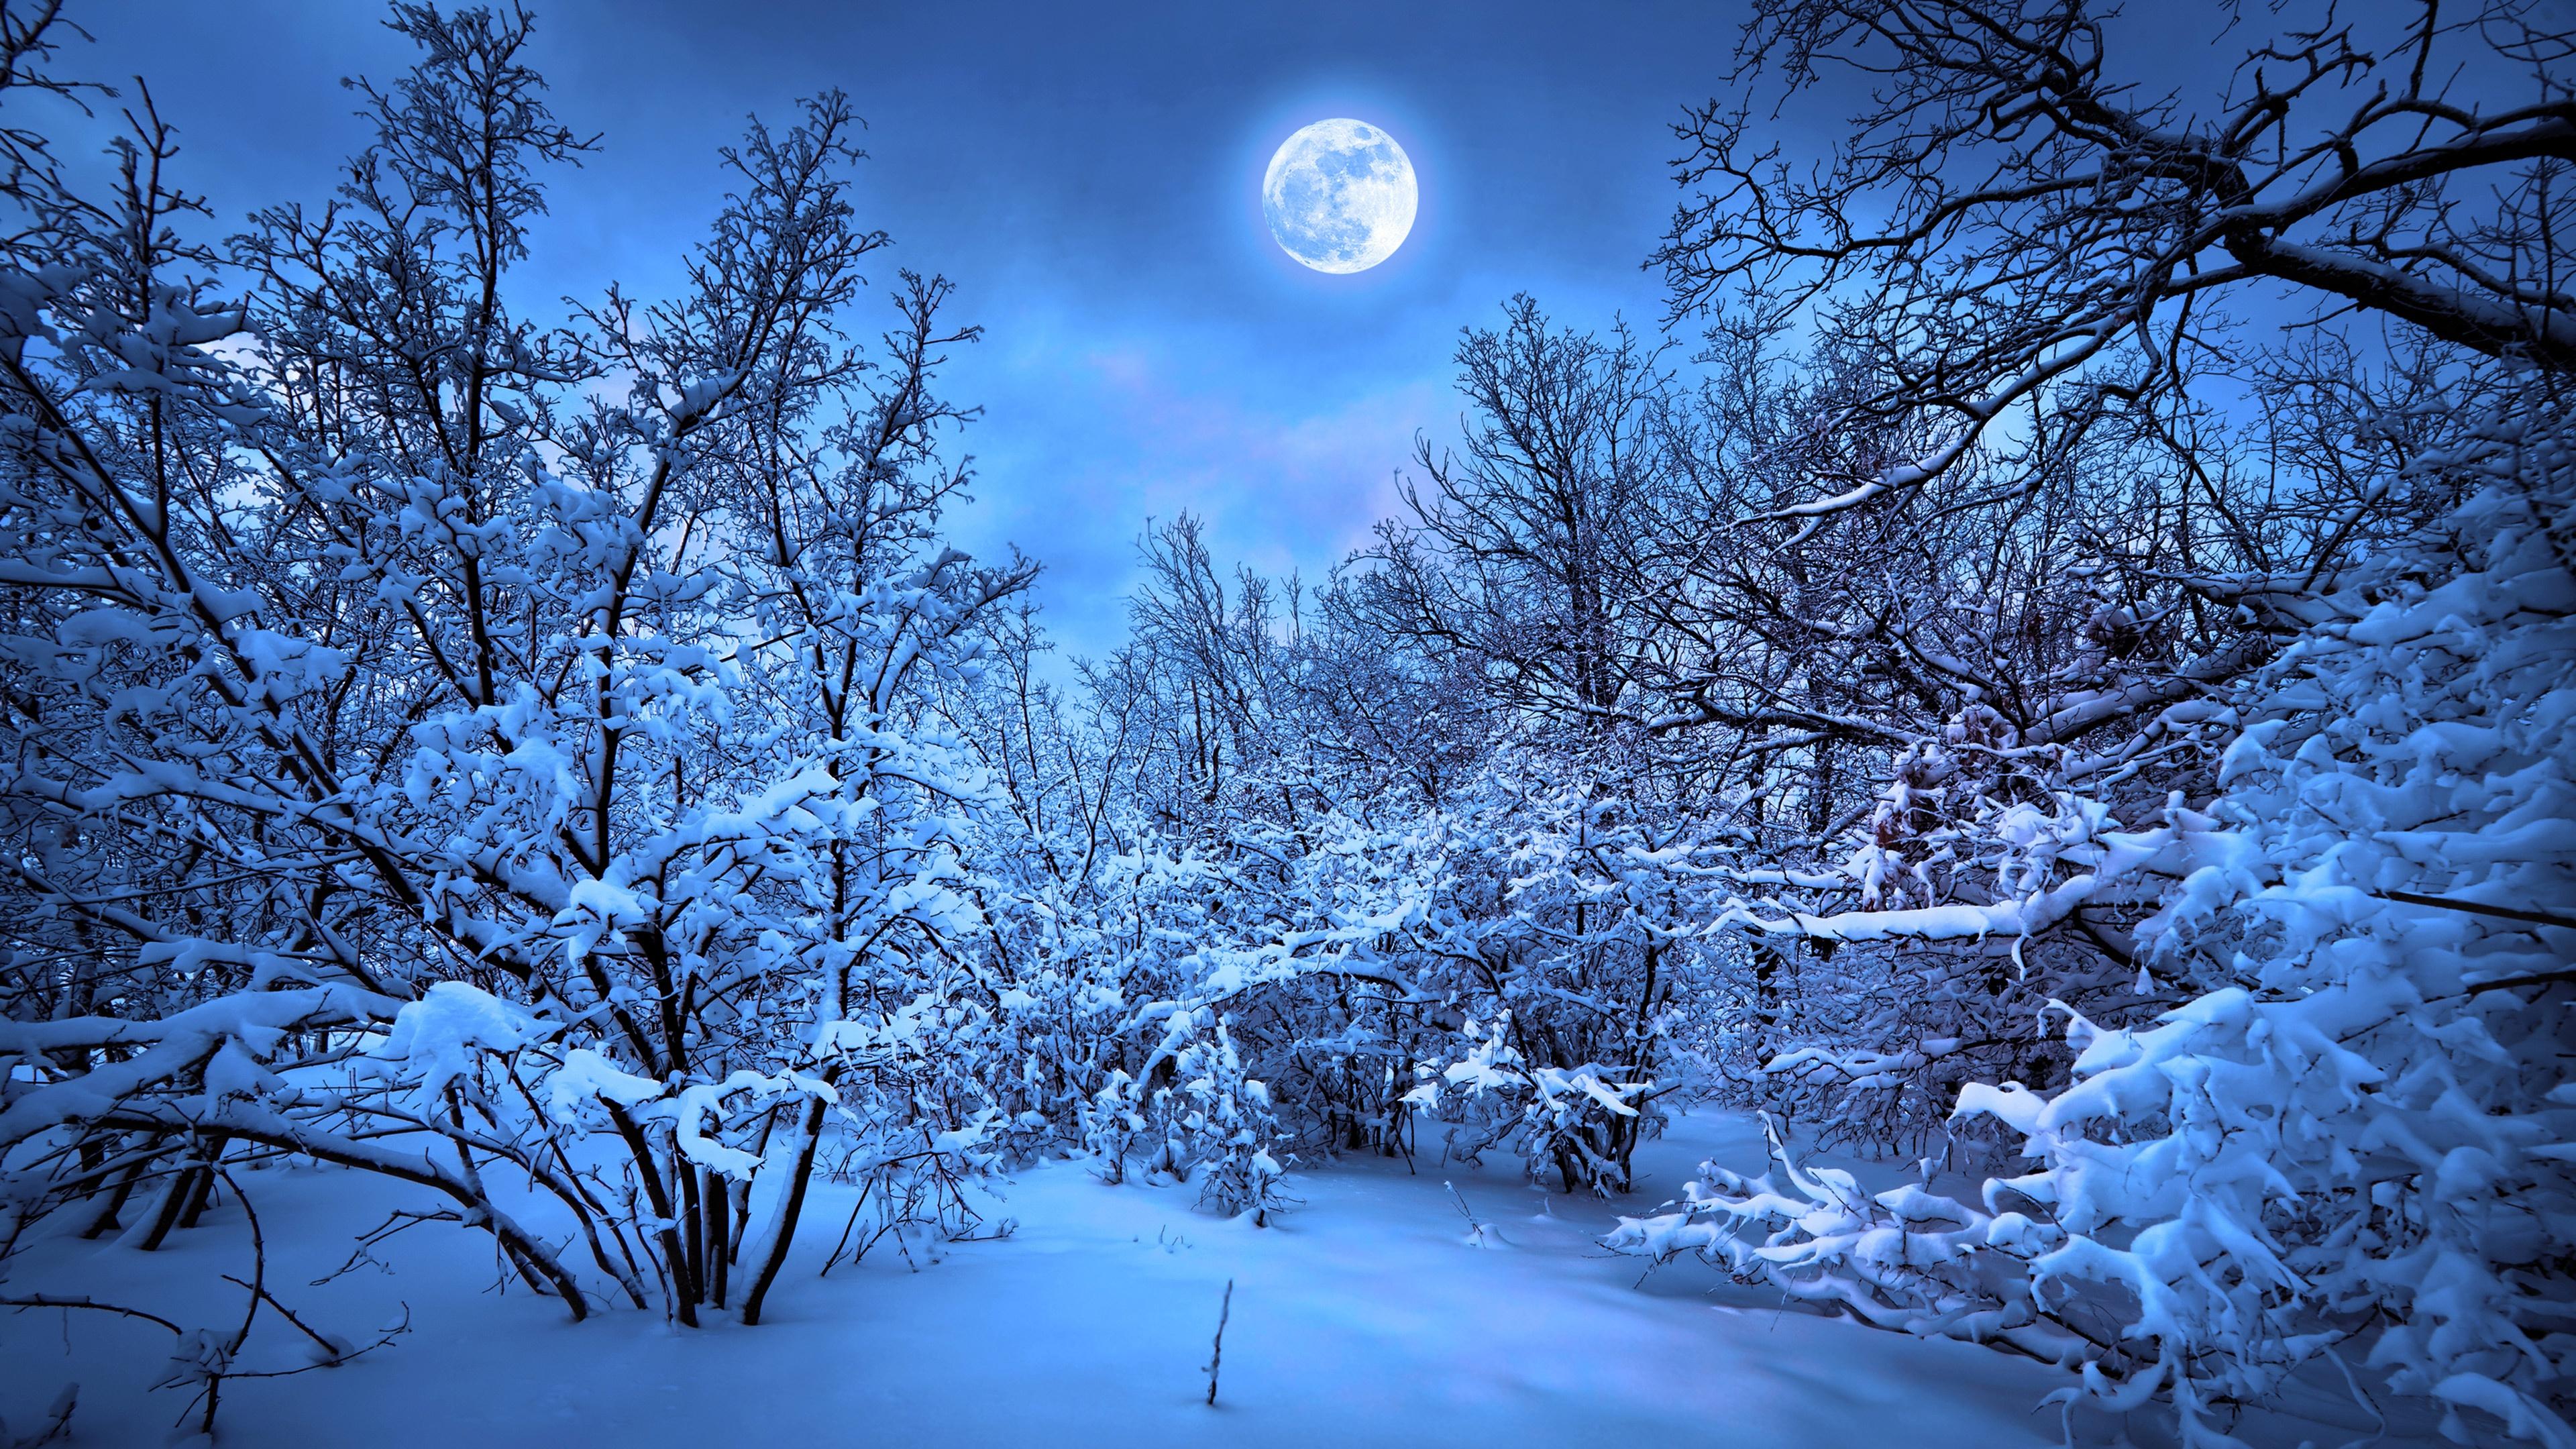 Winter Snow Nature 4k